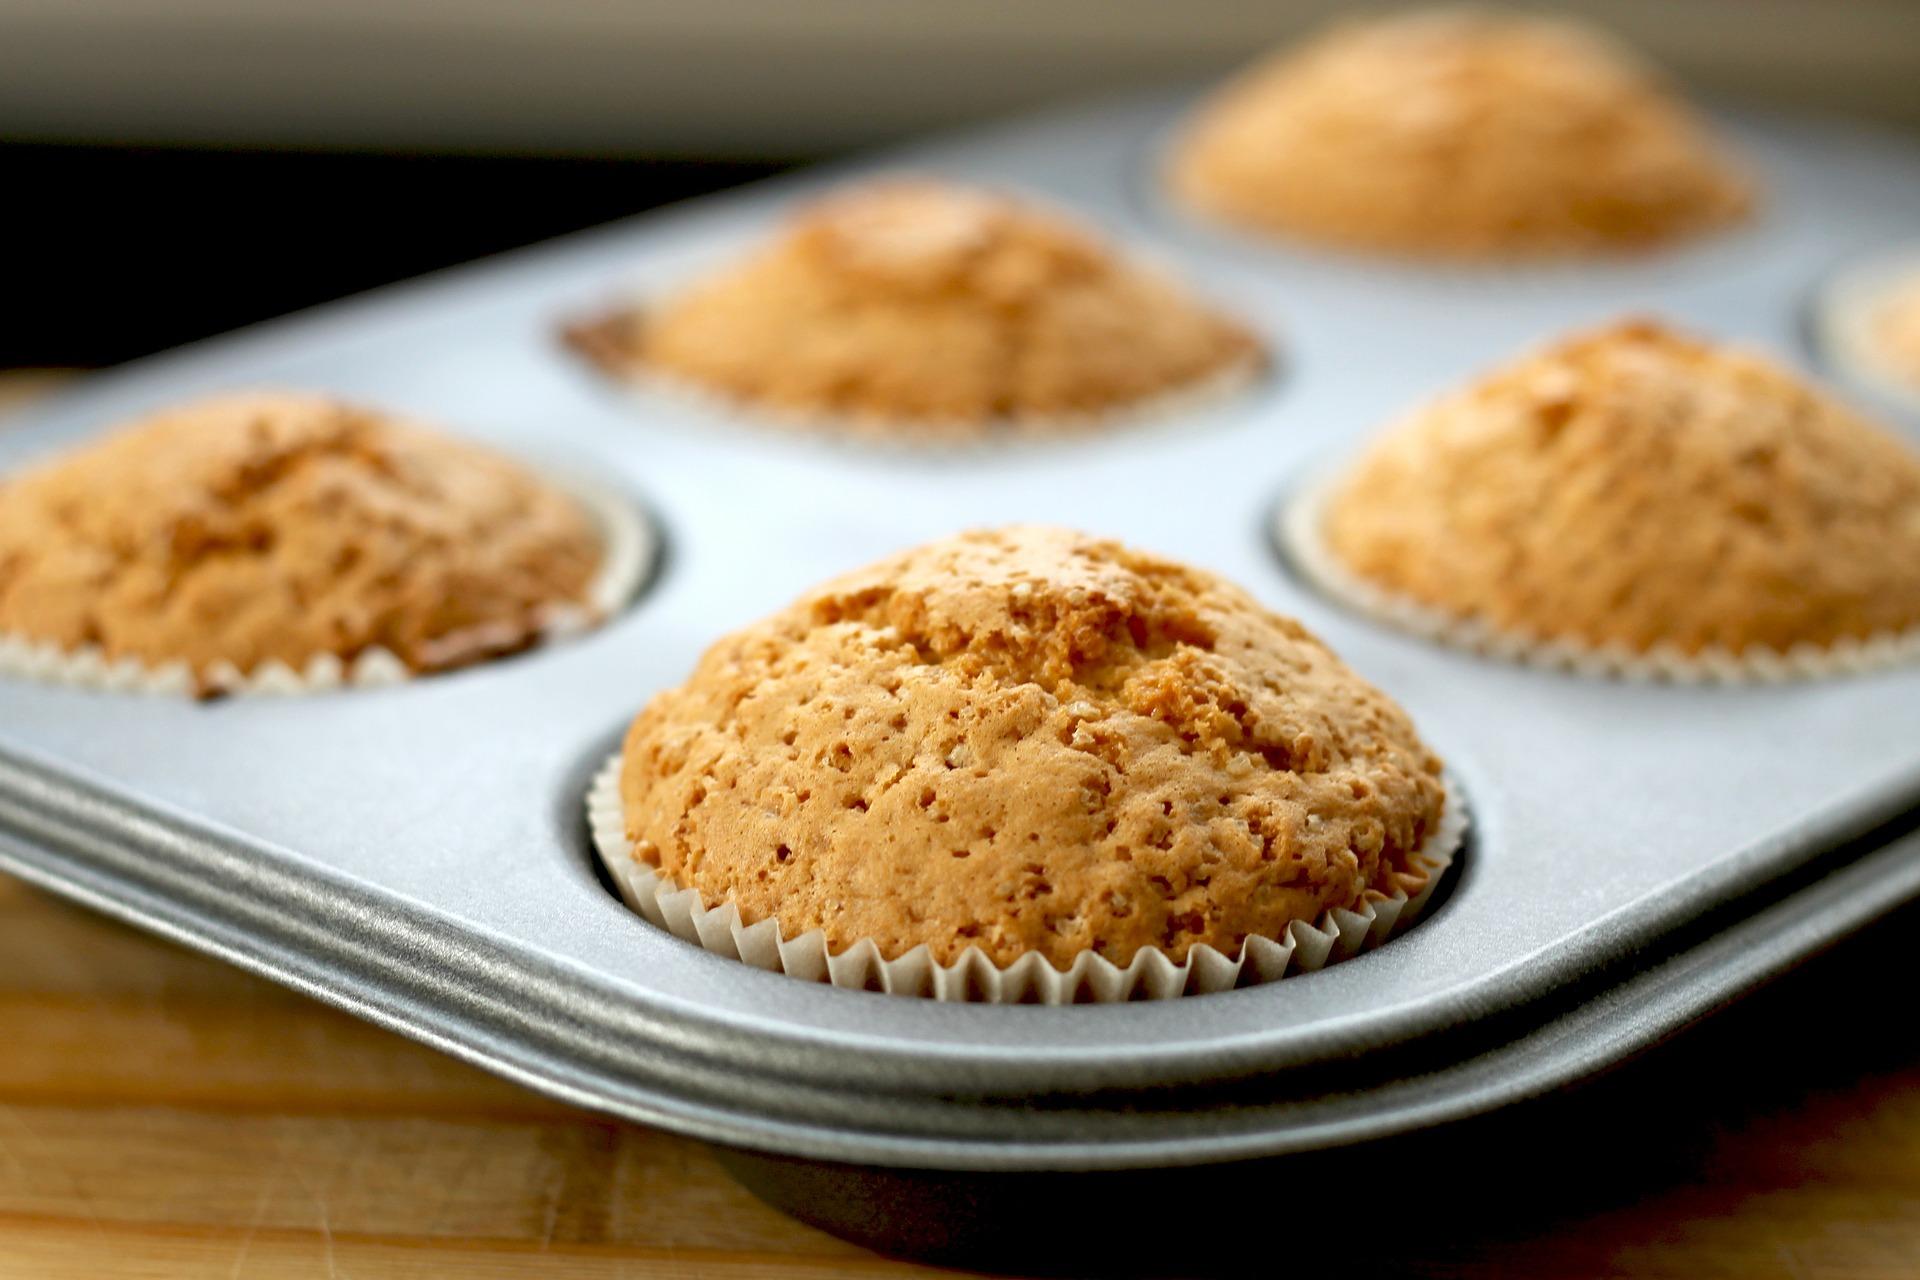 A pan of applesauce oatmeal muffins